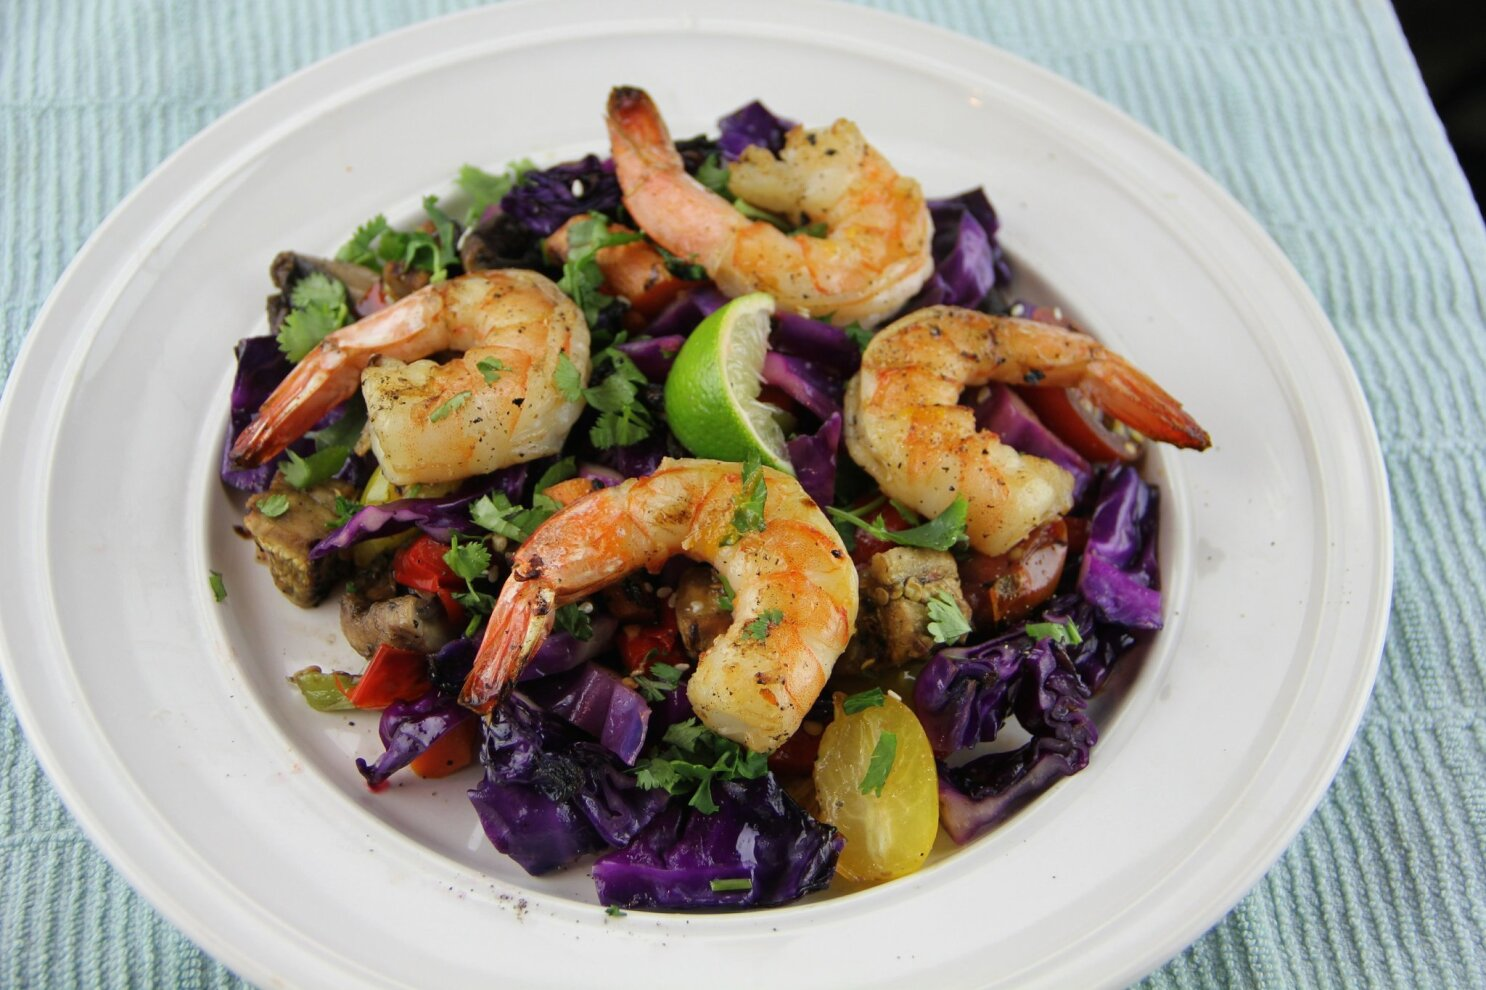 Grilled vegetables put a new spin on shrimp salad - The San Diego ...